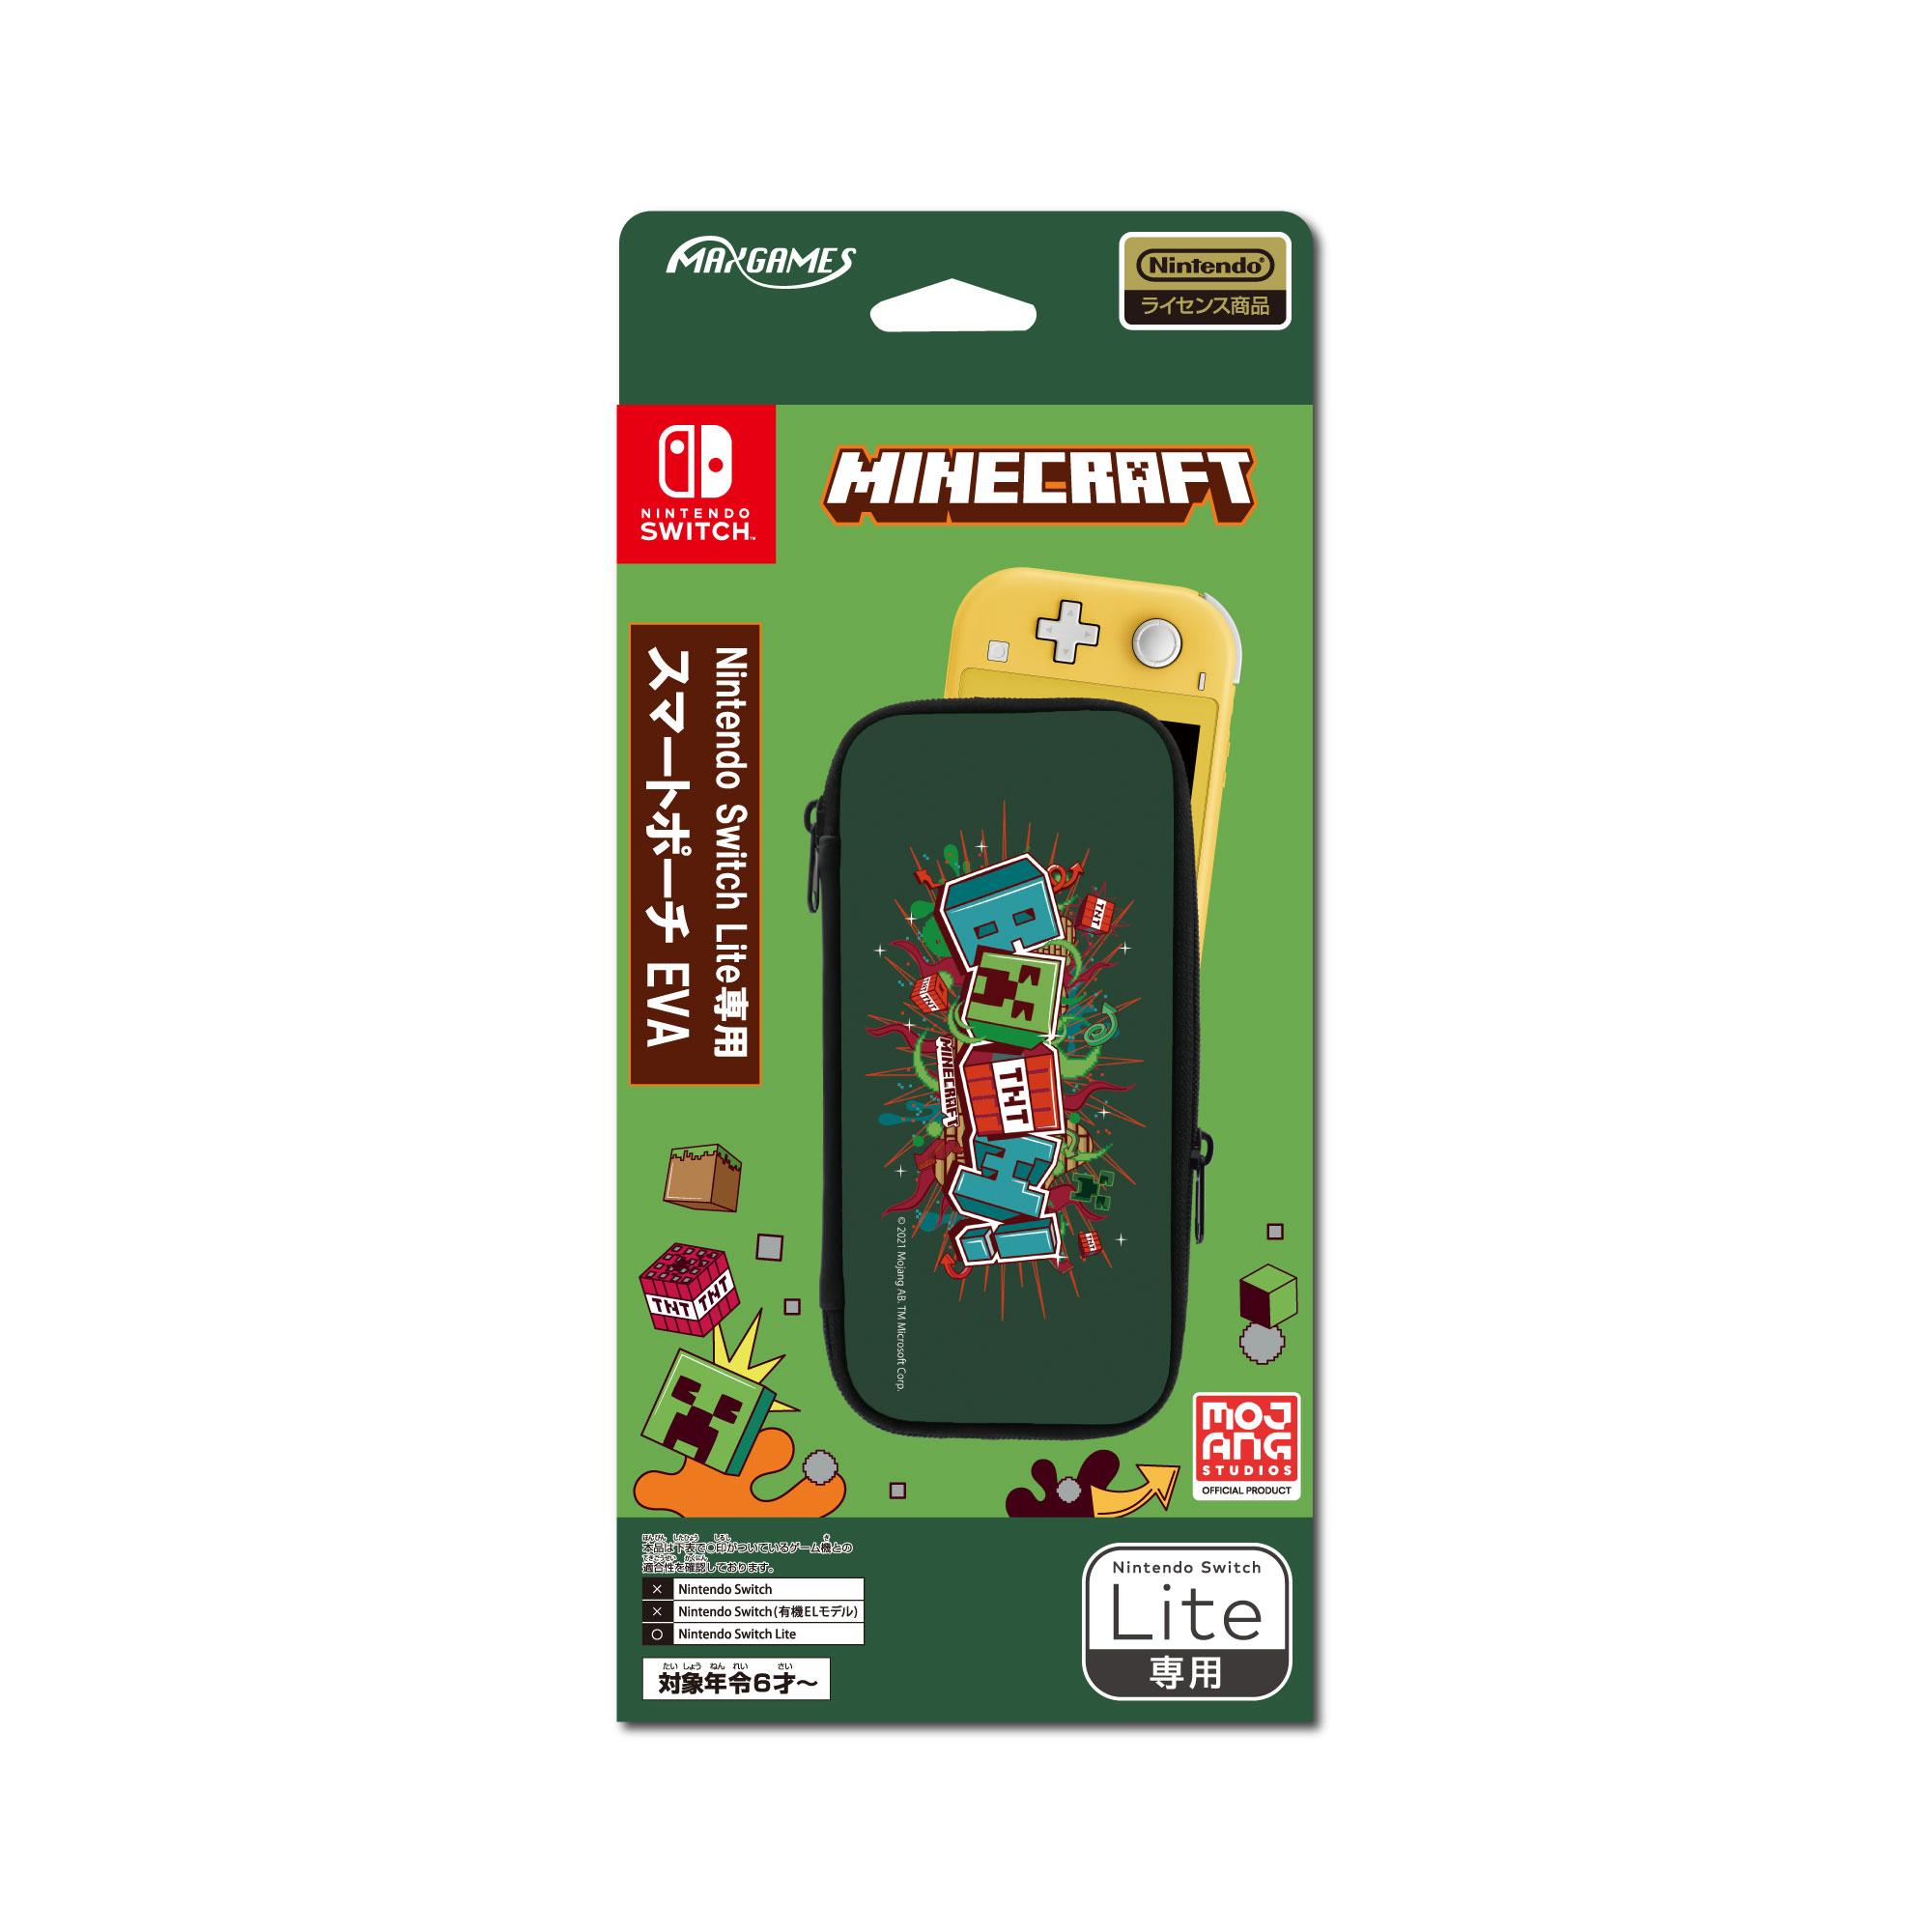 Nintendo Switch Lite専用<br>スマートポーチEVA<br>マインクラフト グラフィックデザイン